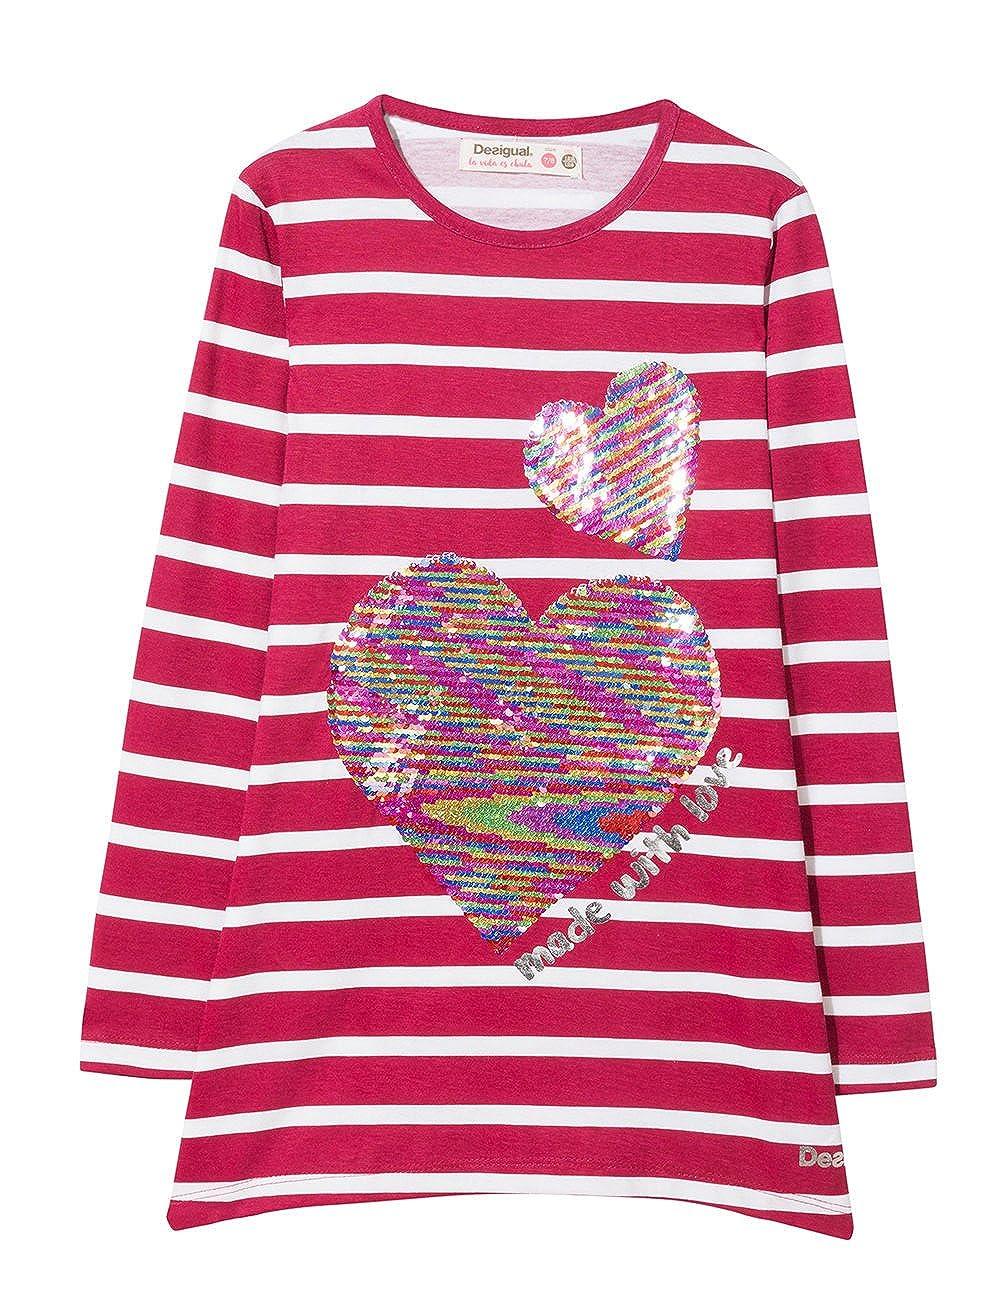 Desigual Girls Ts/_chivite T-Shirt